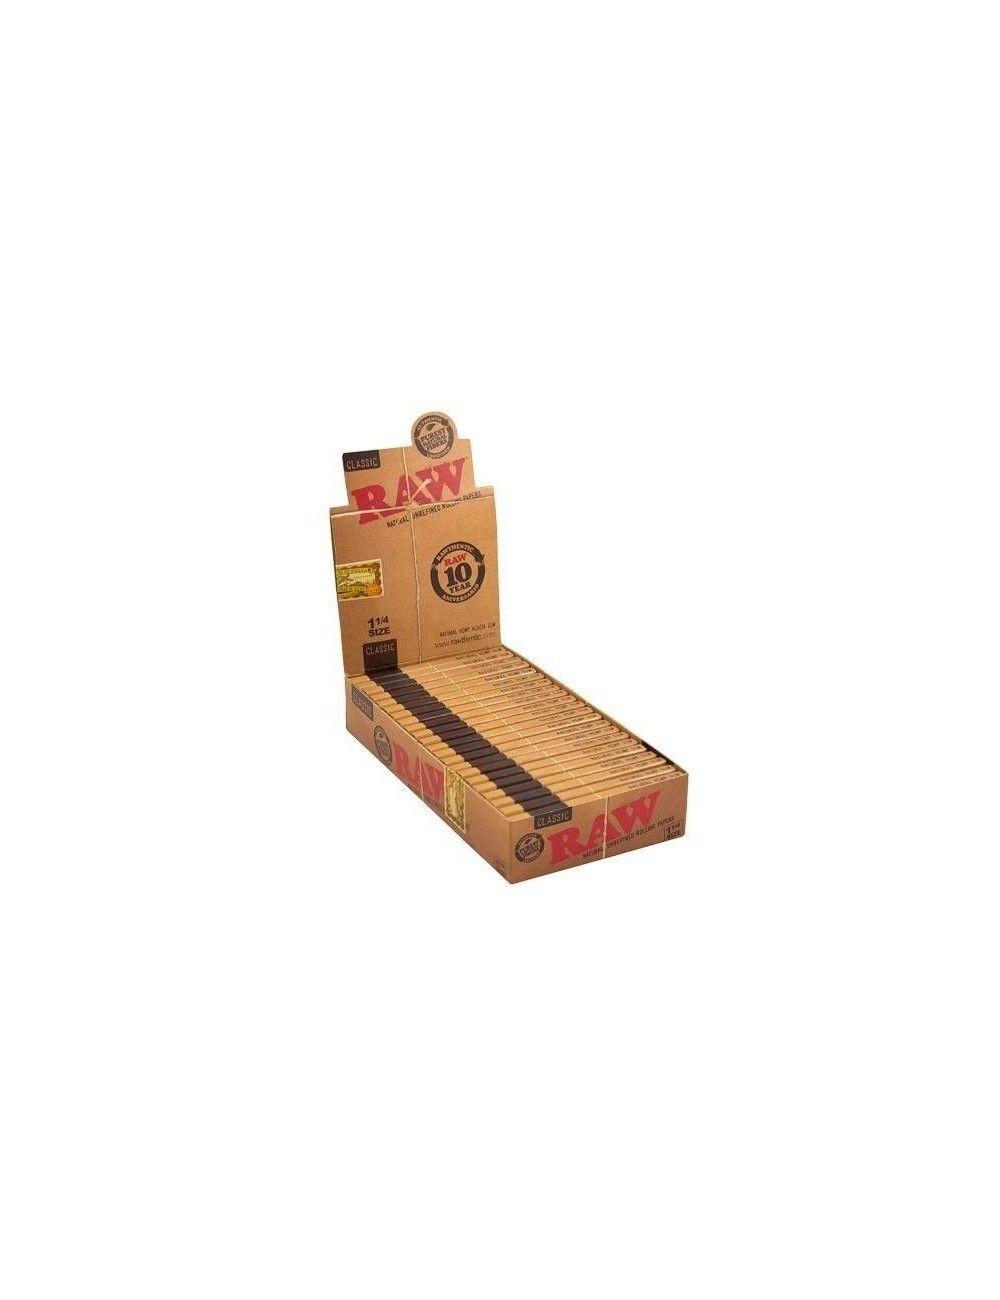 RAW Classic 1¼ Size BOX